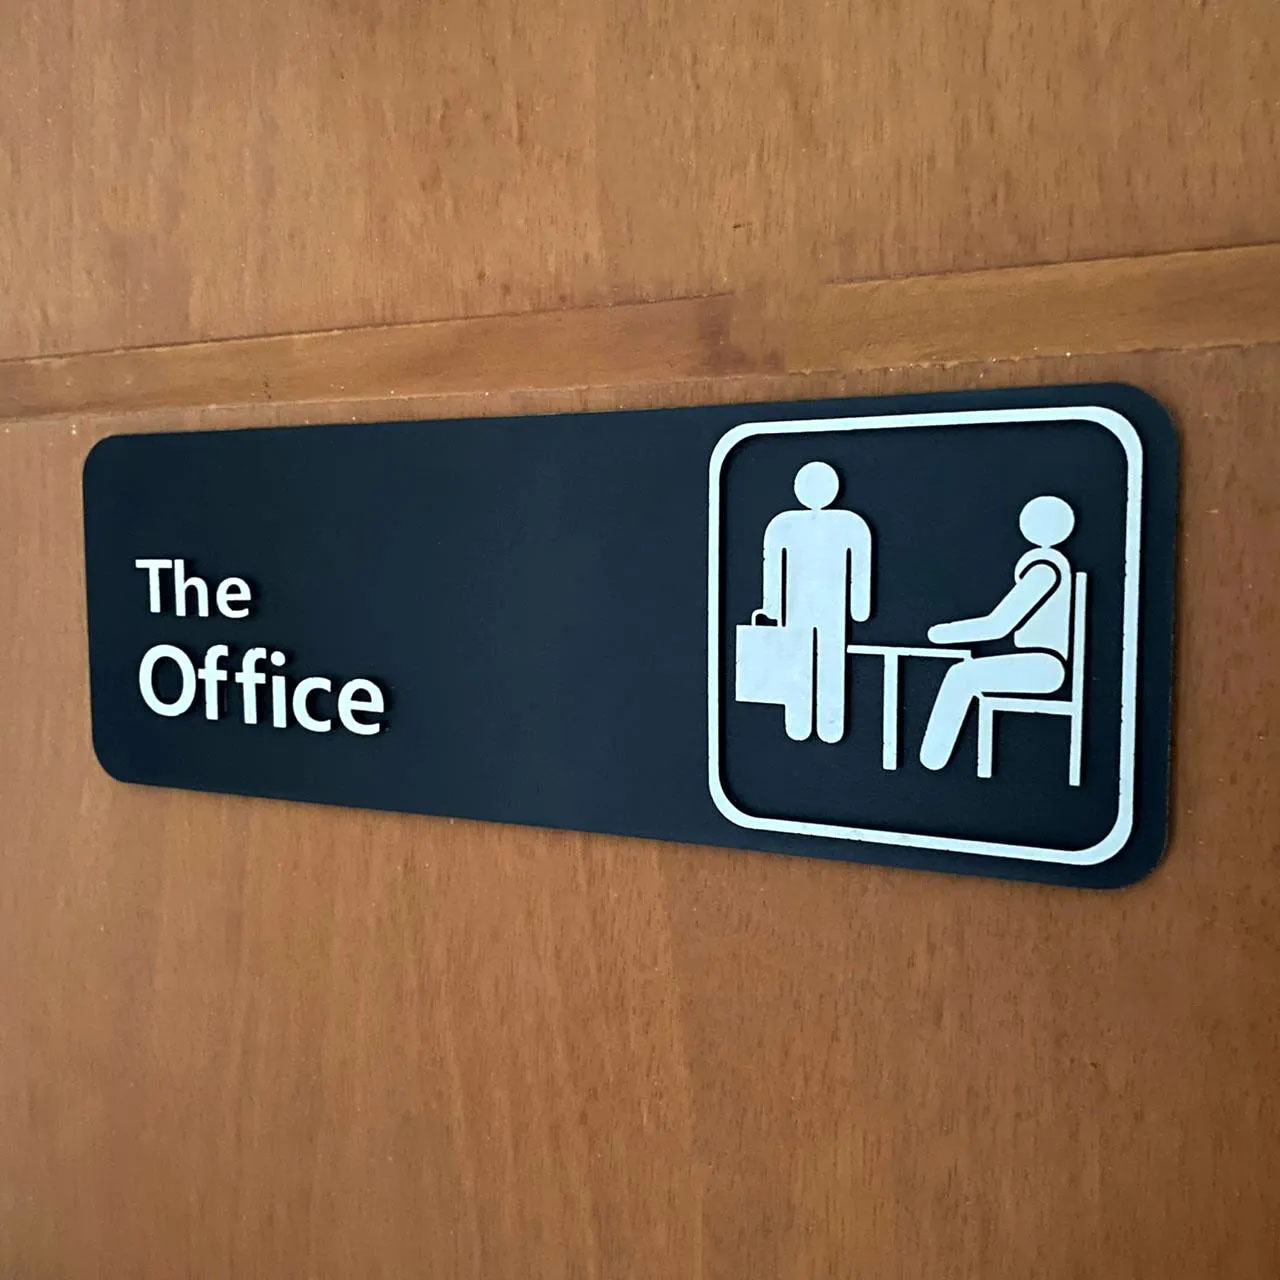 Kit The Office Super